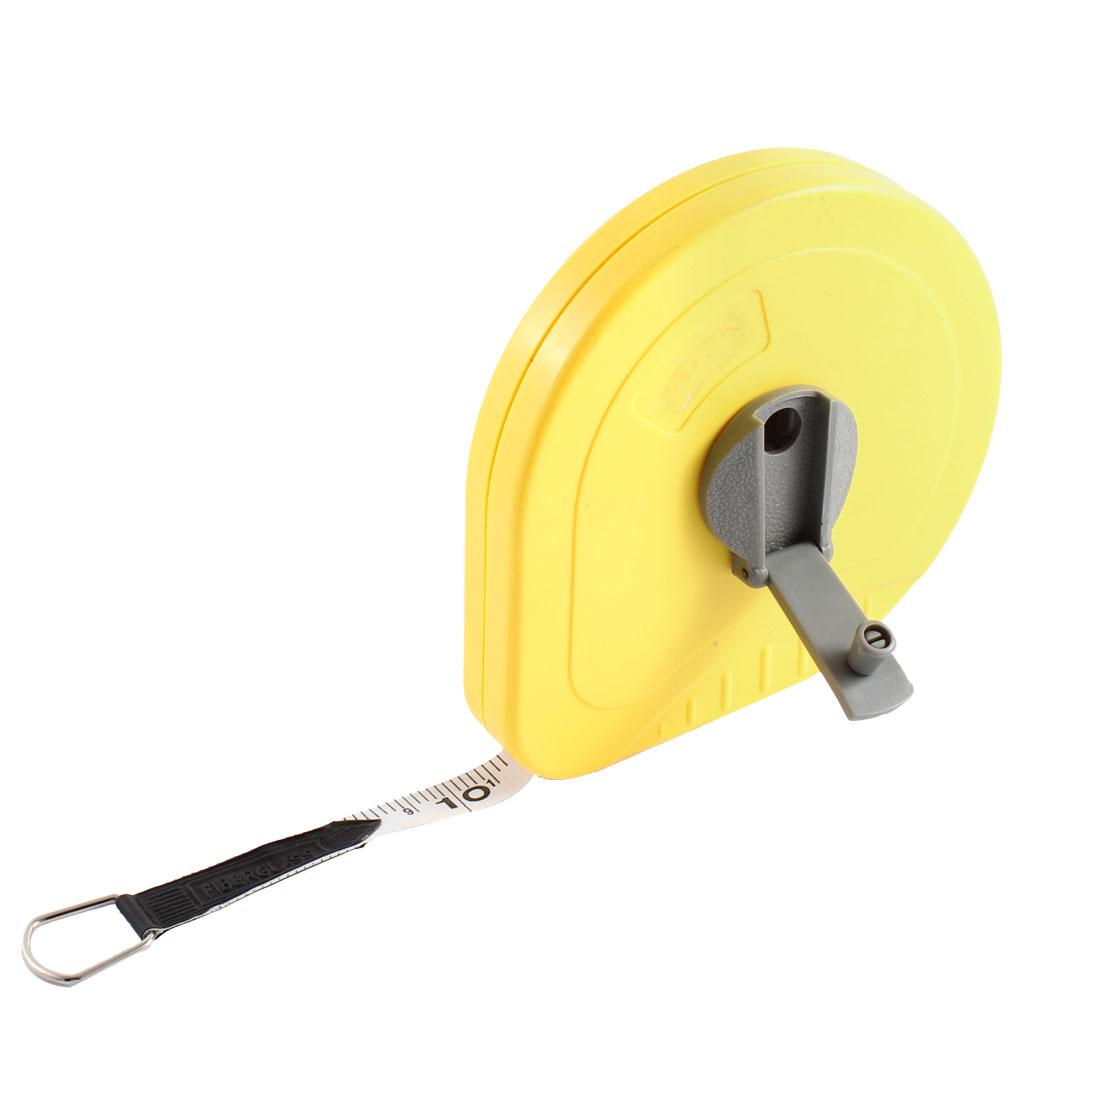 Fibreglass Surveyors Measure Tape Reel Roll Measuring Tool 20M